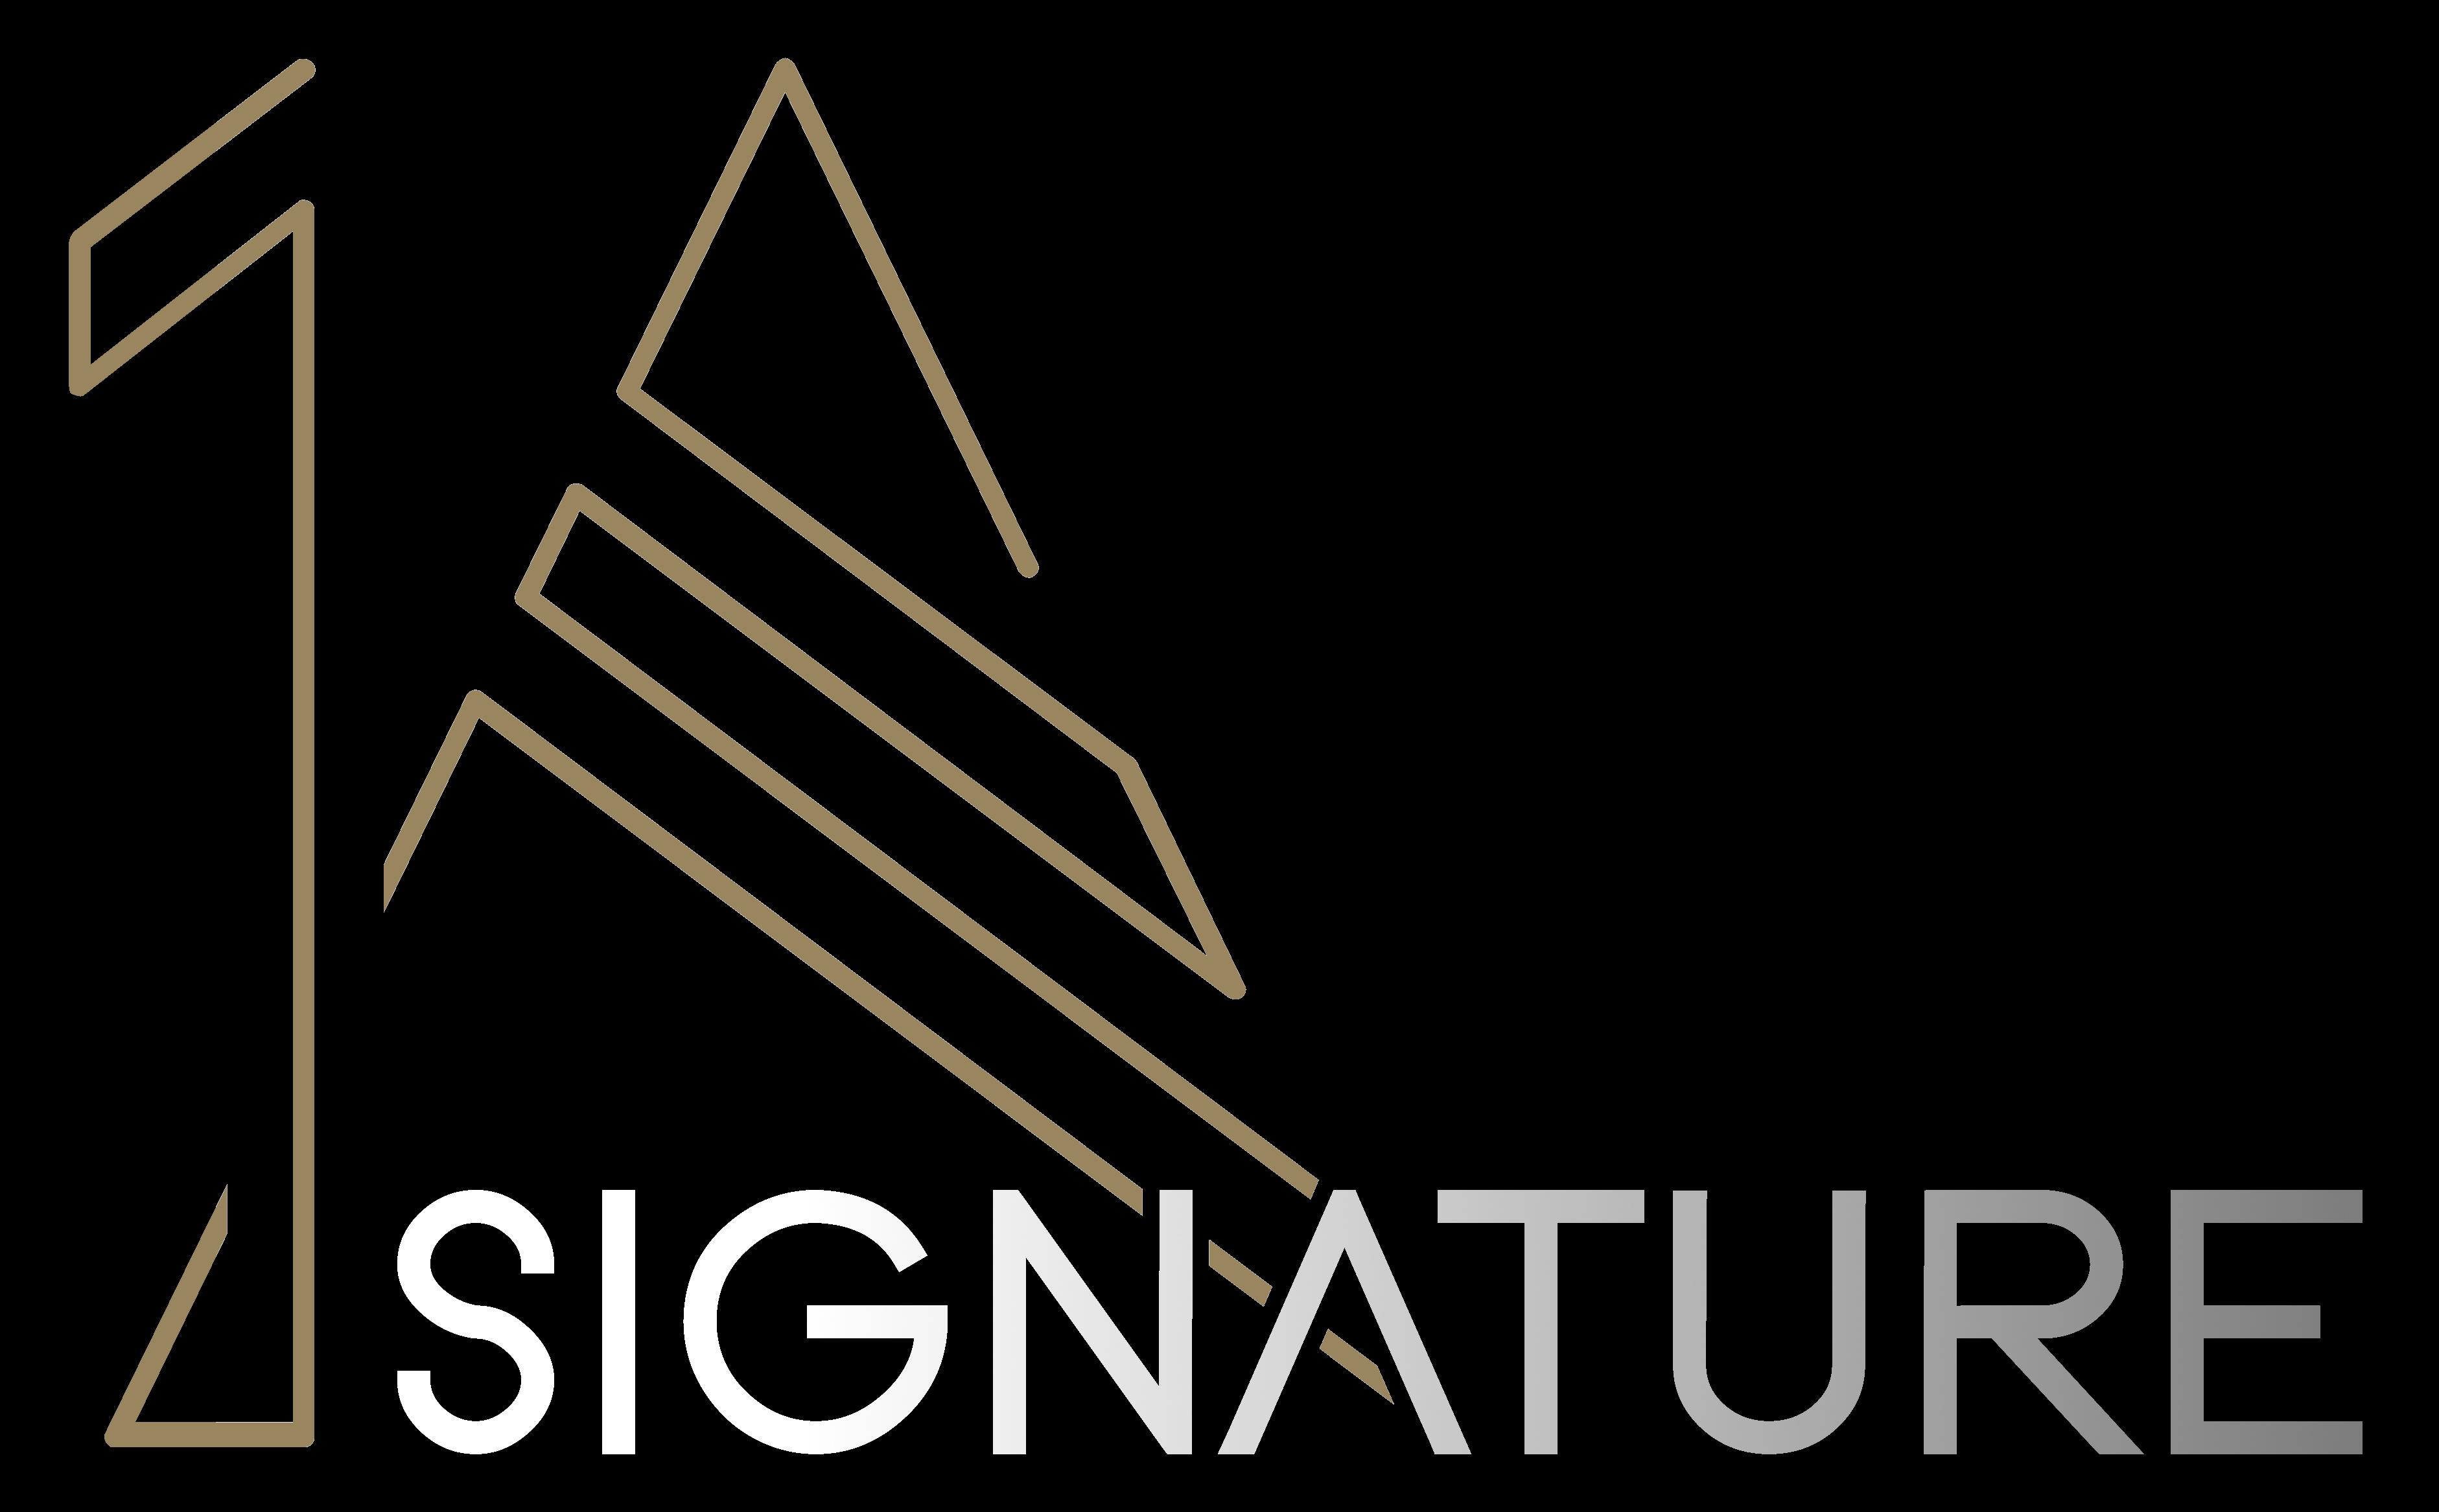 1A Signature Firmenlogo